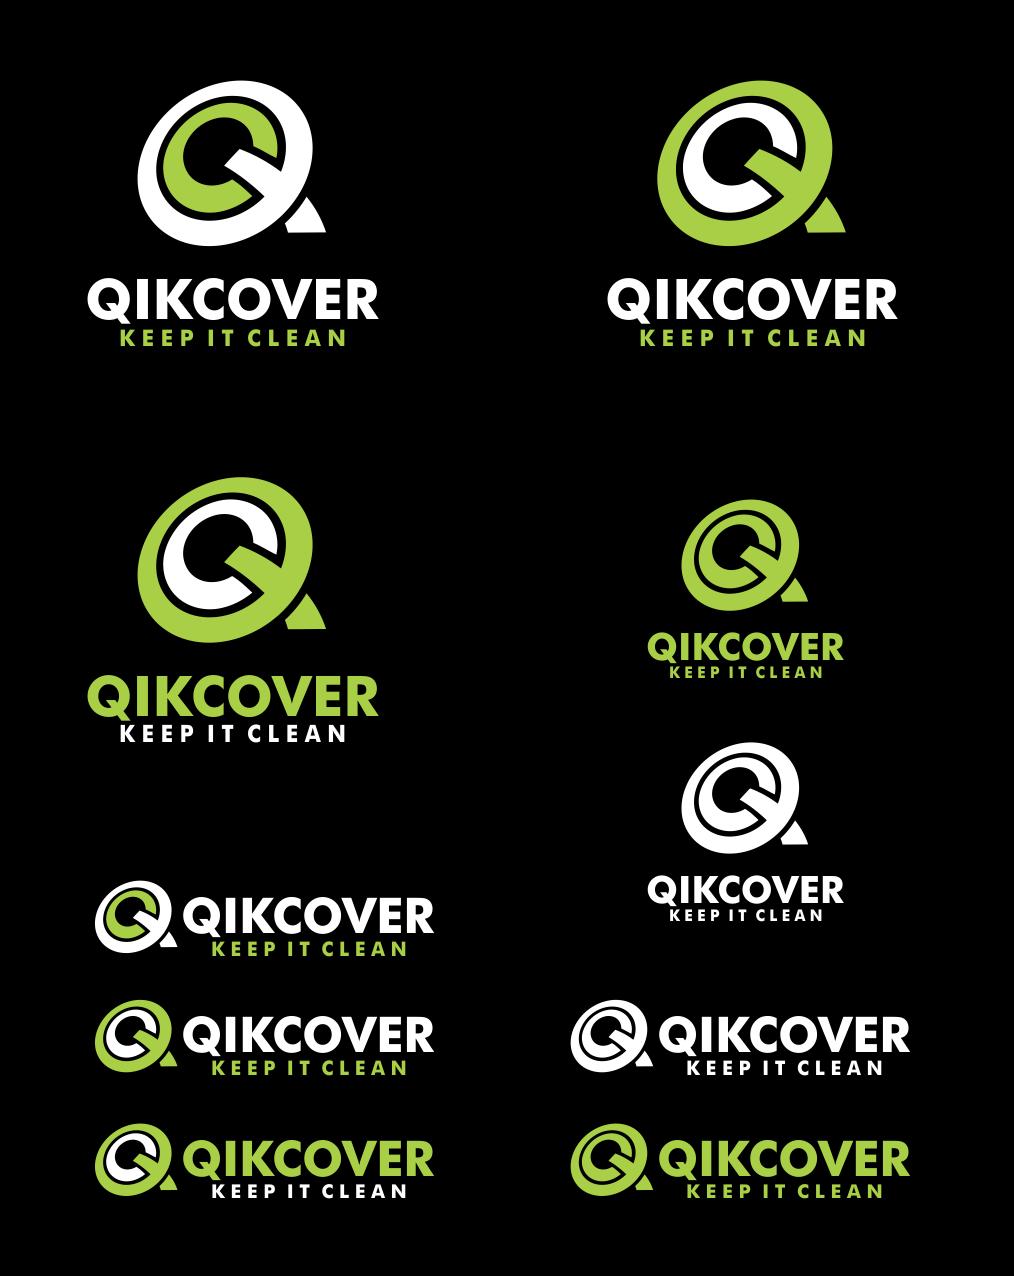 QIKCOVER™ needs a new logo